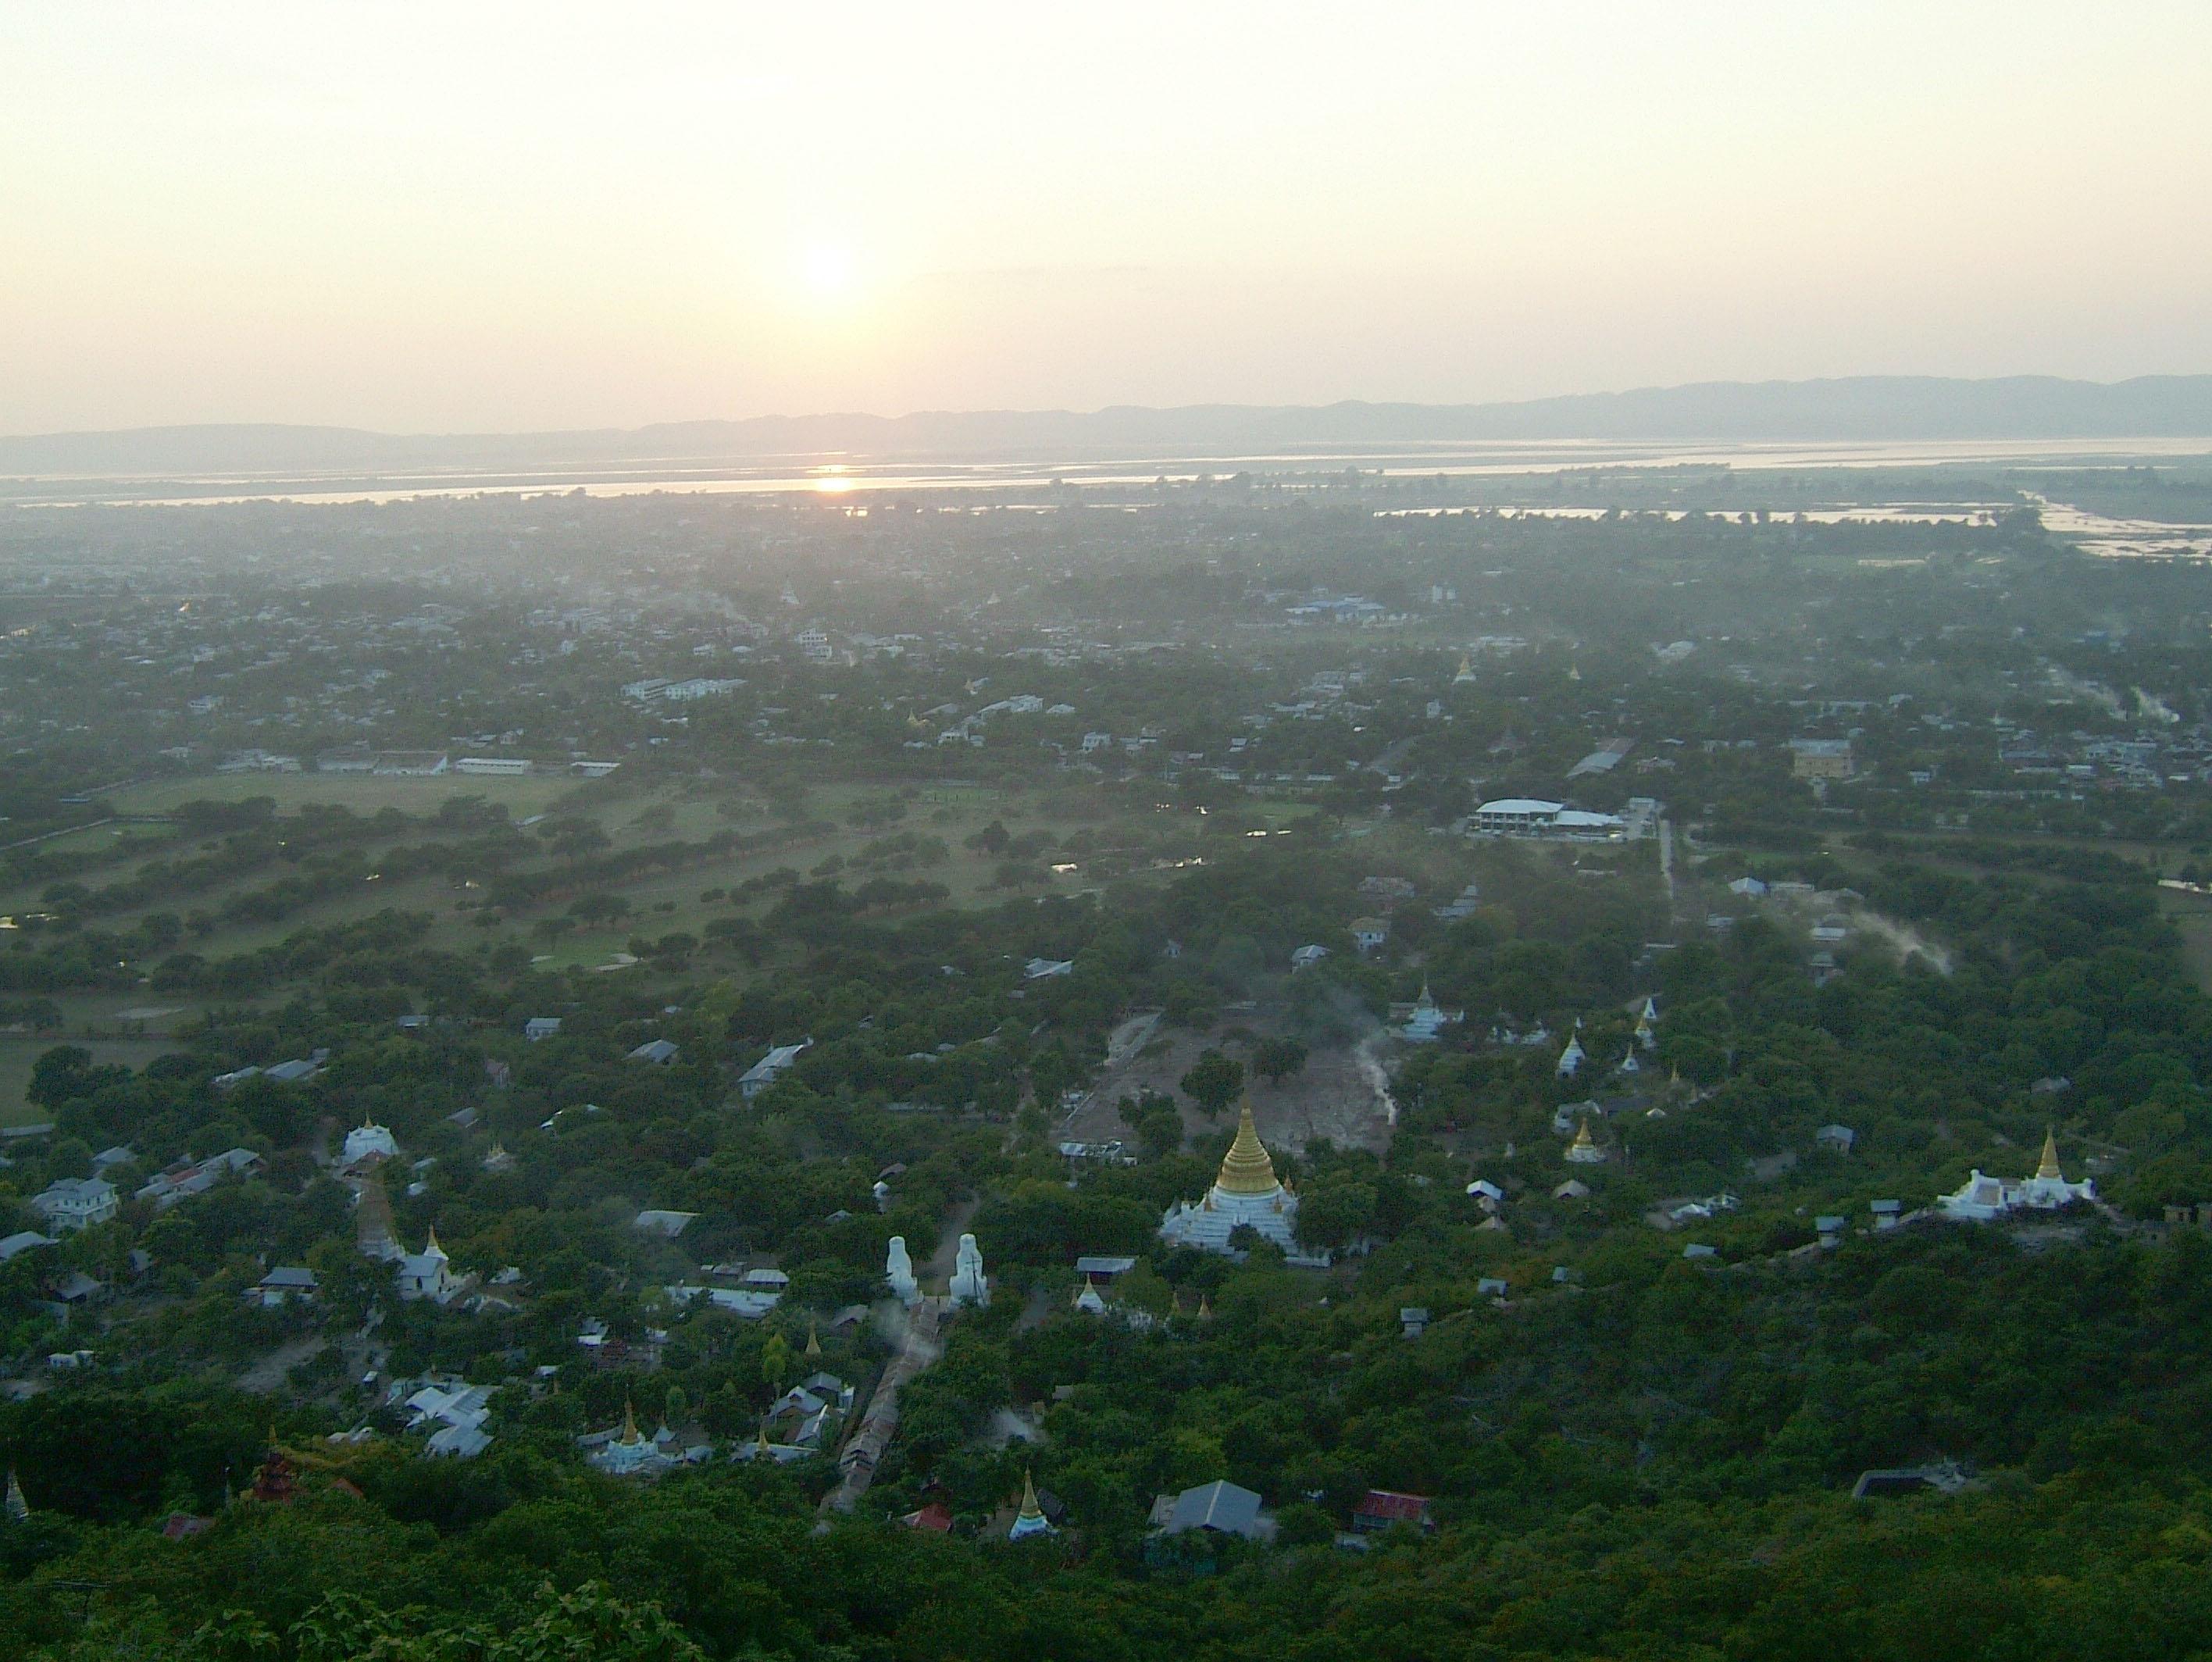 Mandalay Hill Sutaungpyei Pagoda sunset Nov 2004 05